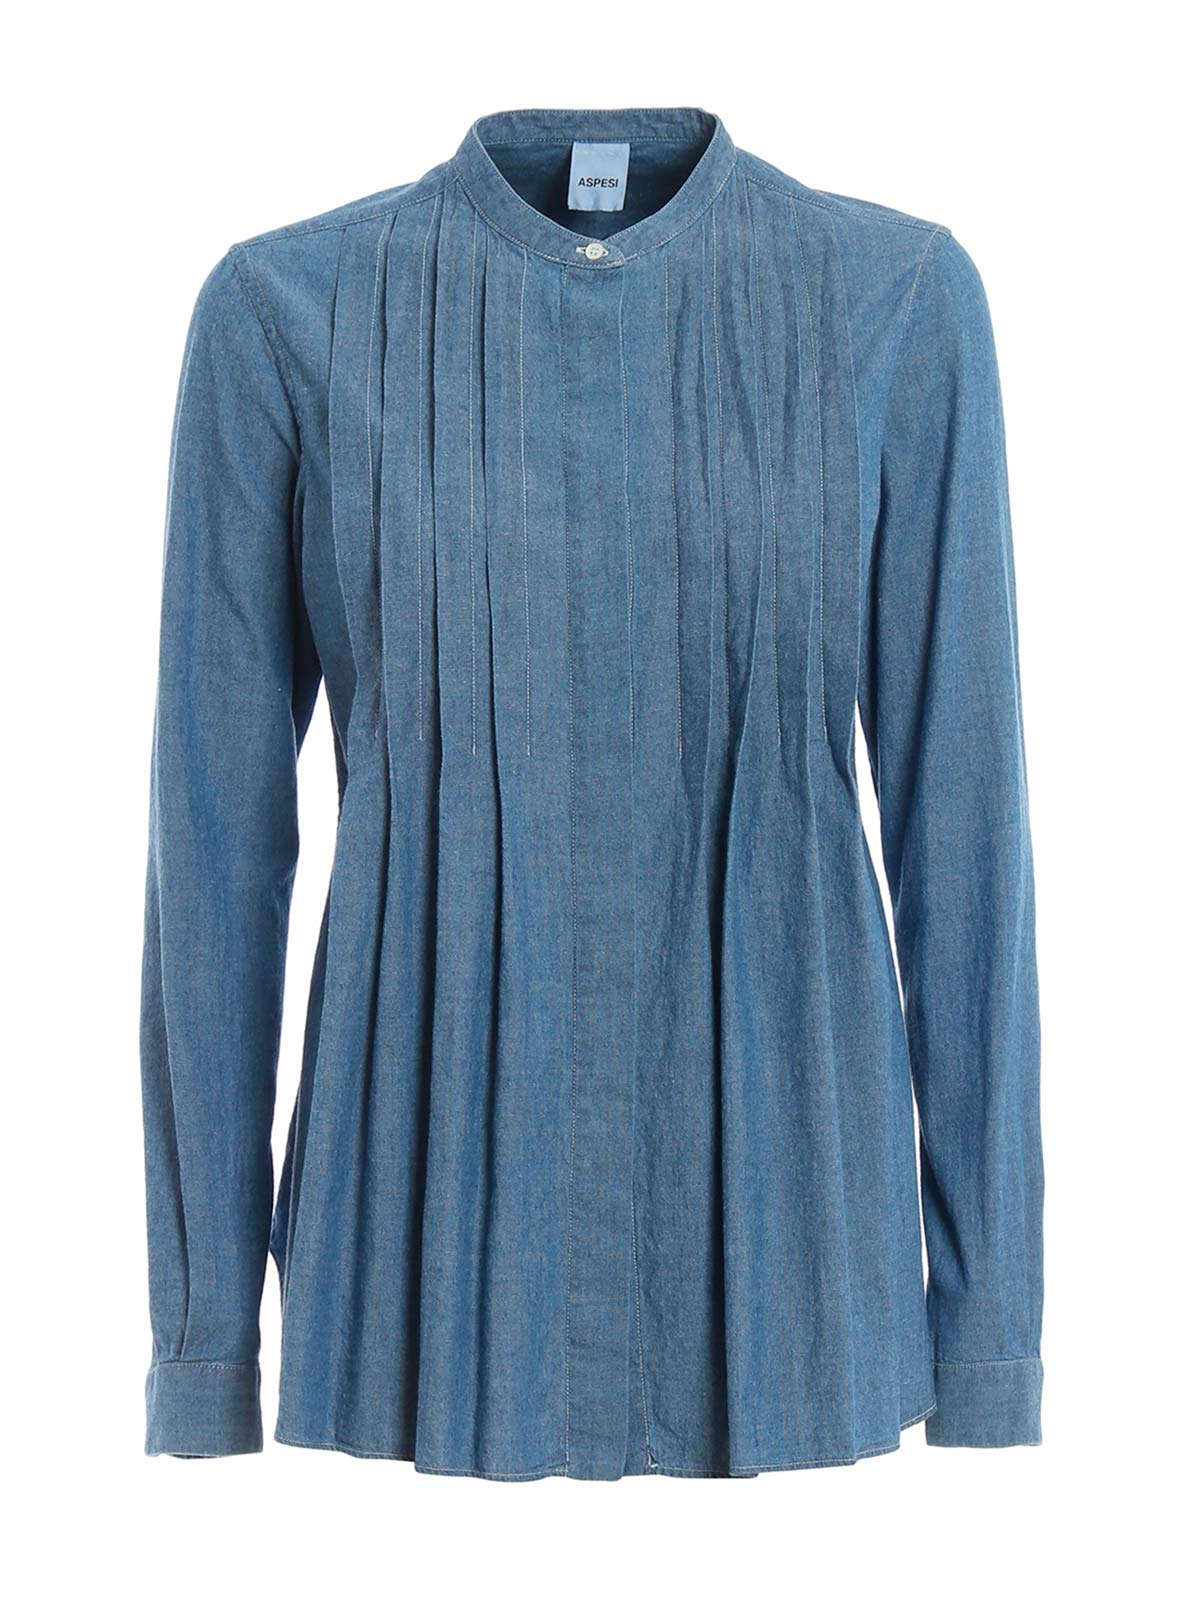 Picture of ASPESI | Women's Denim Shirt